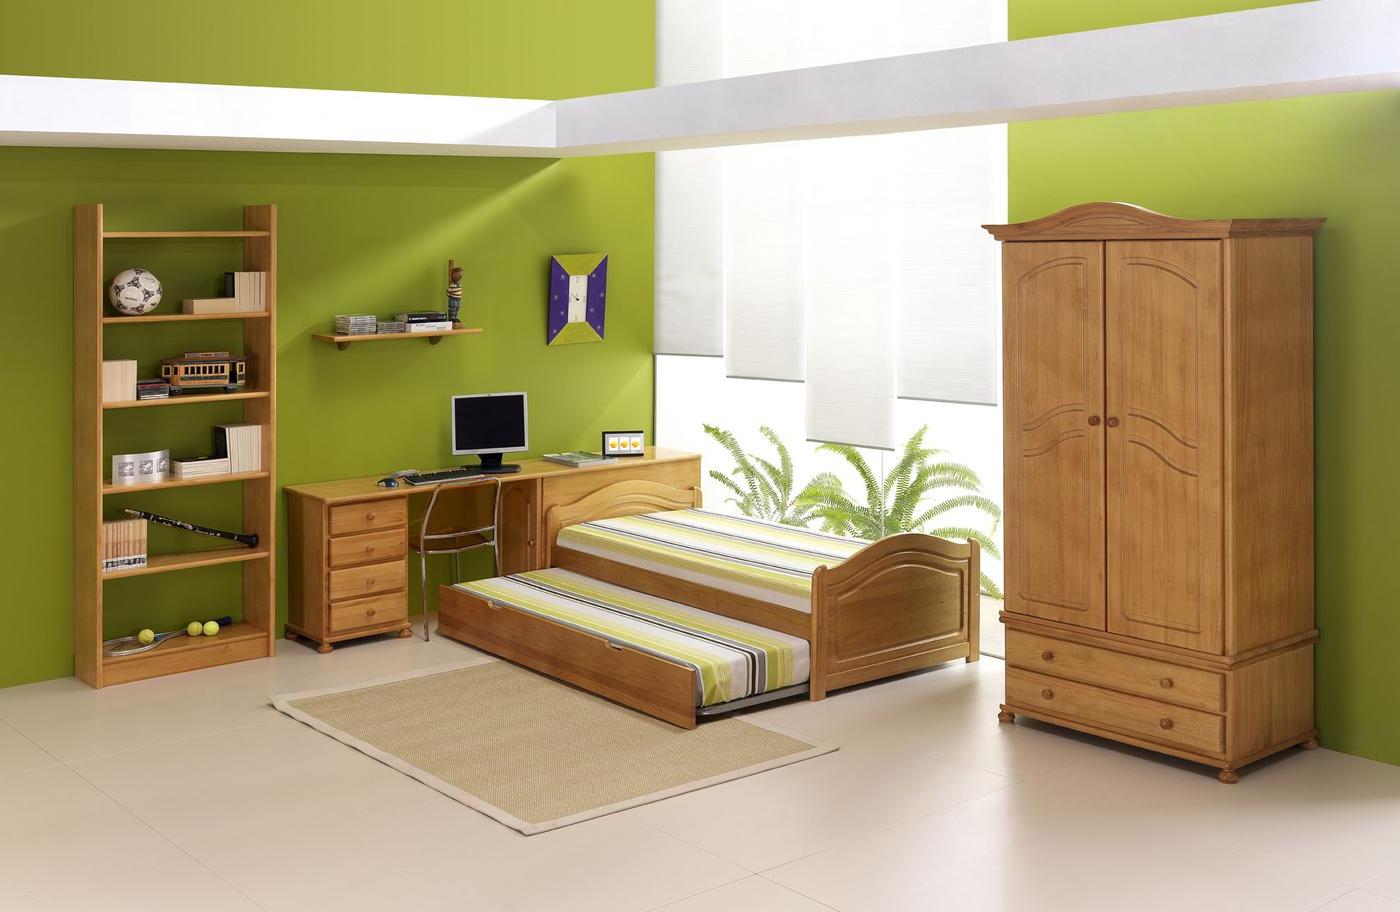 Muebles Habitacion Budm Habitacià N Juvenil Carole 10 Dormitorios Juvenil Online Muebles